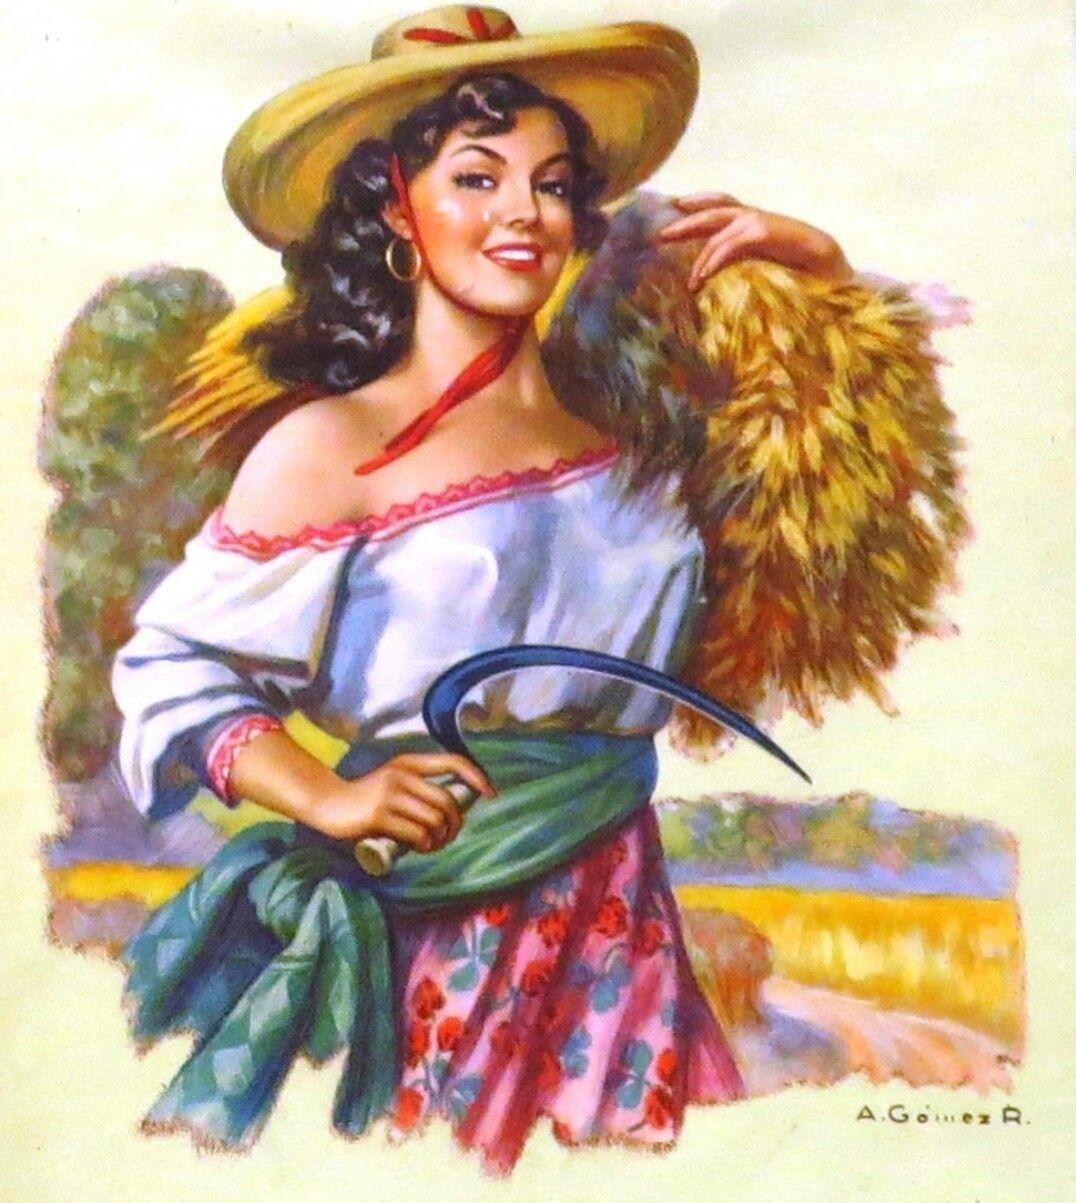 José Bribiesca Ruvalcaba, México, 1915-1959